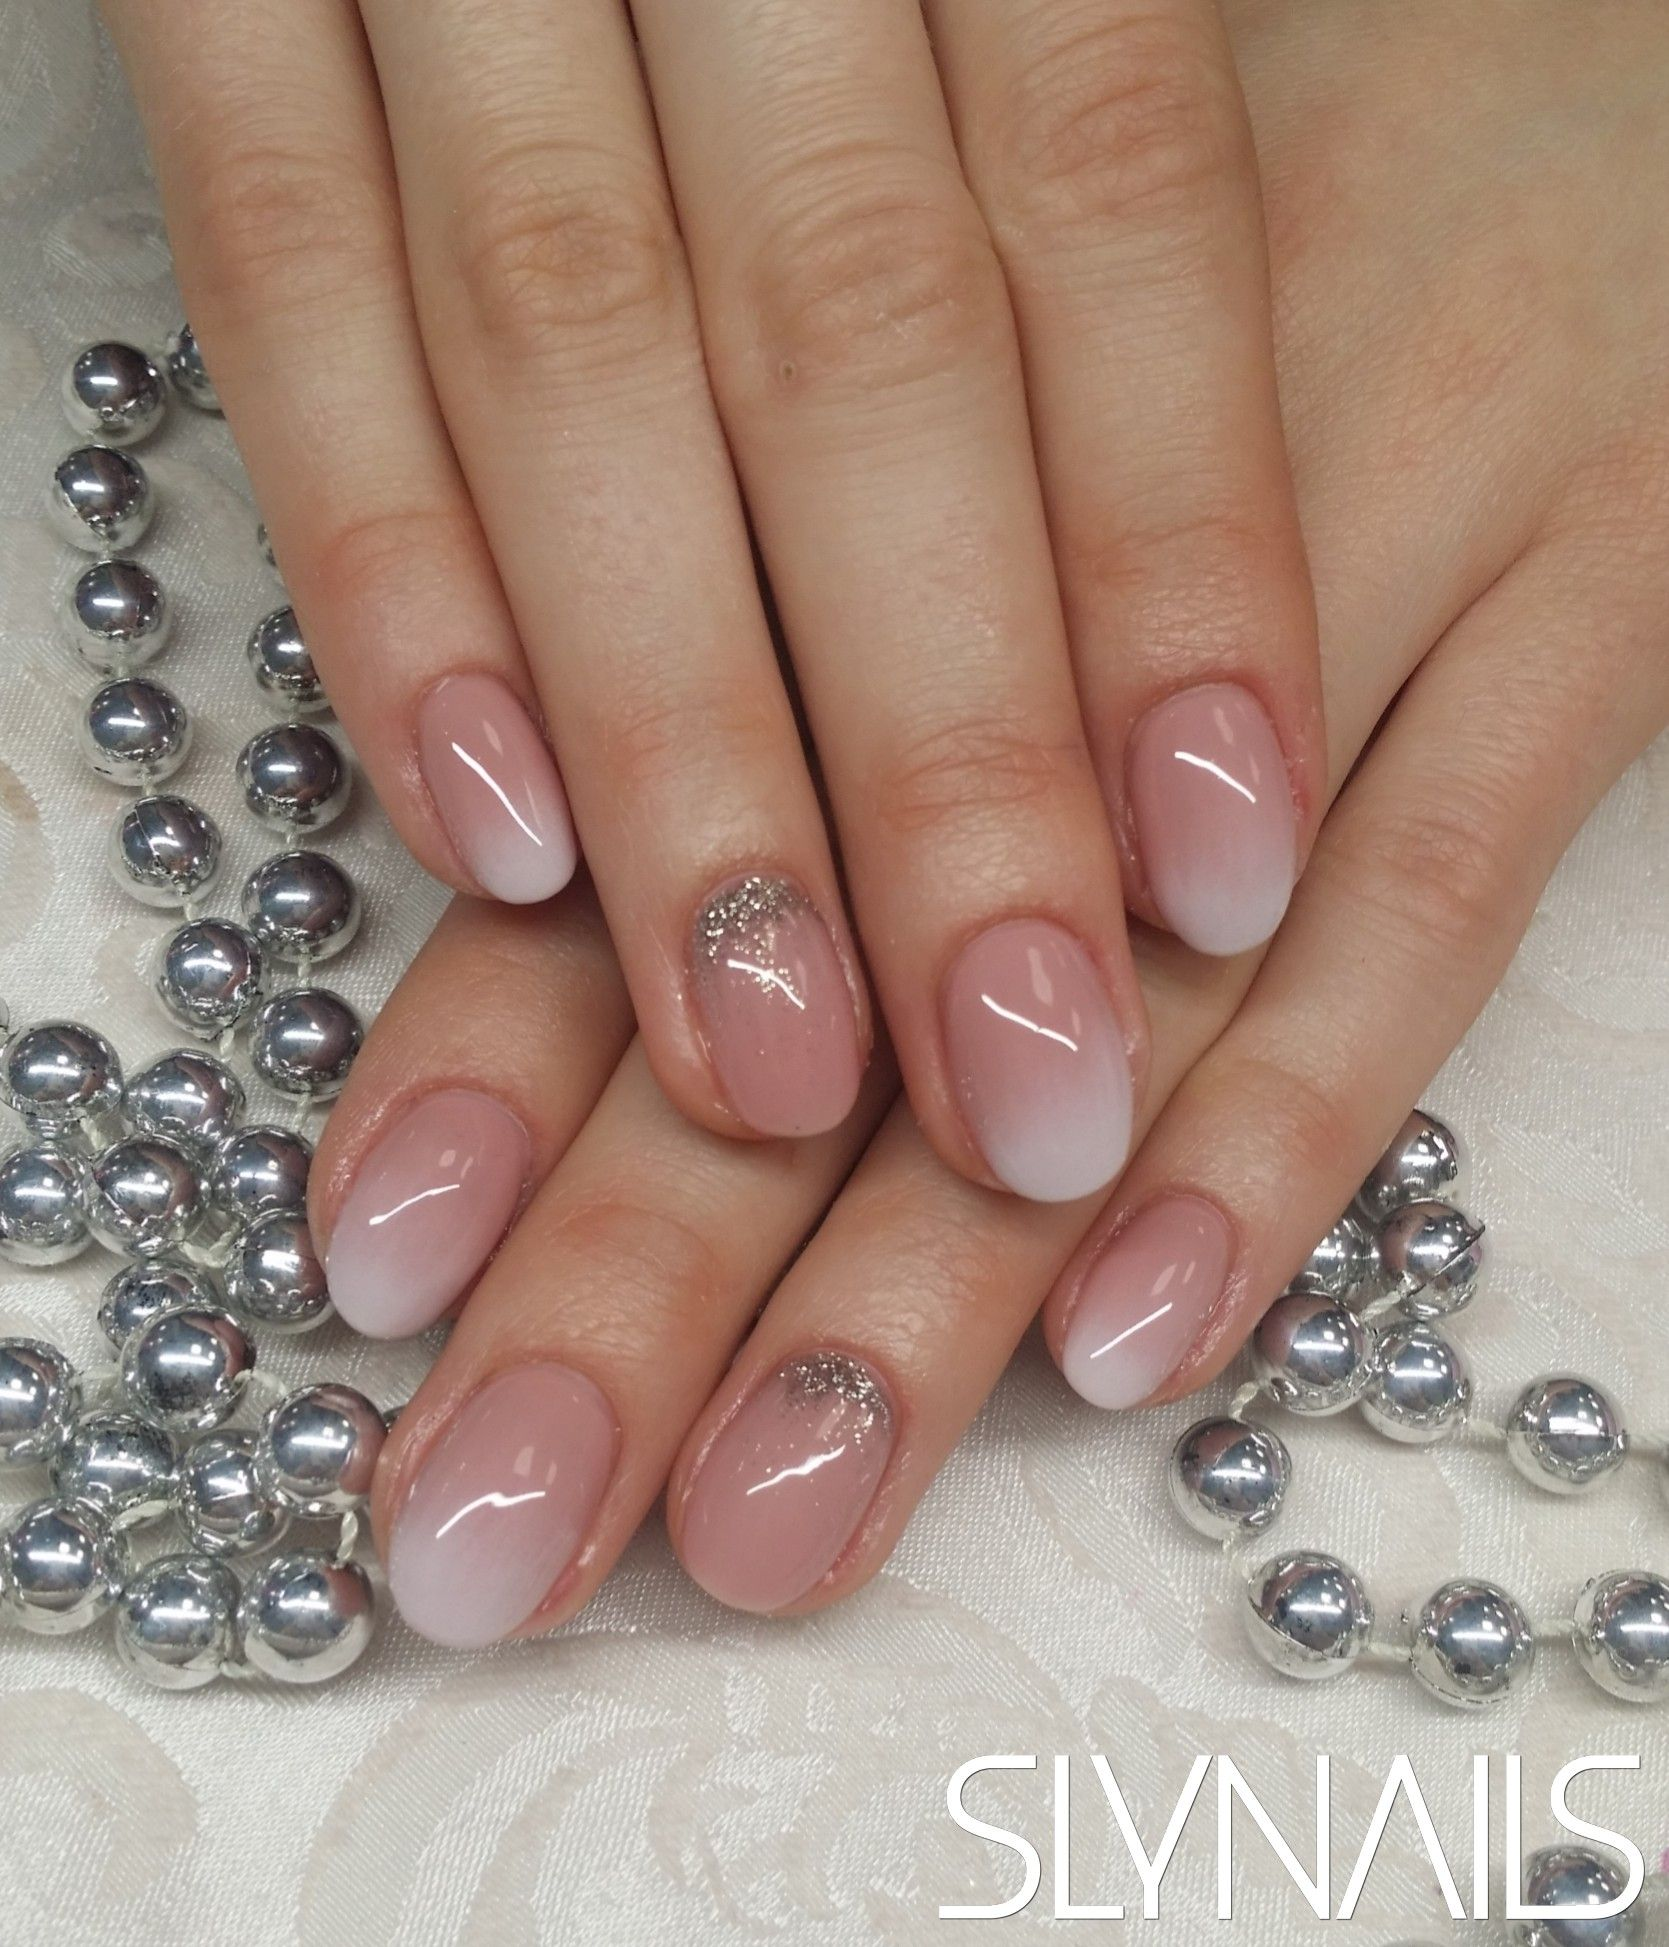 Babyboomer Gelnails Gellakk Slynails Rednails Glitternails Gel Nail Extensions Crystal Nails Nail Length